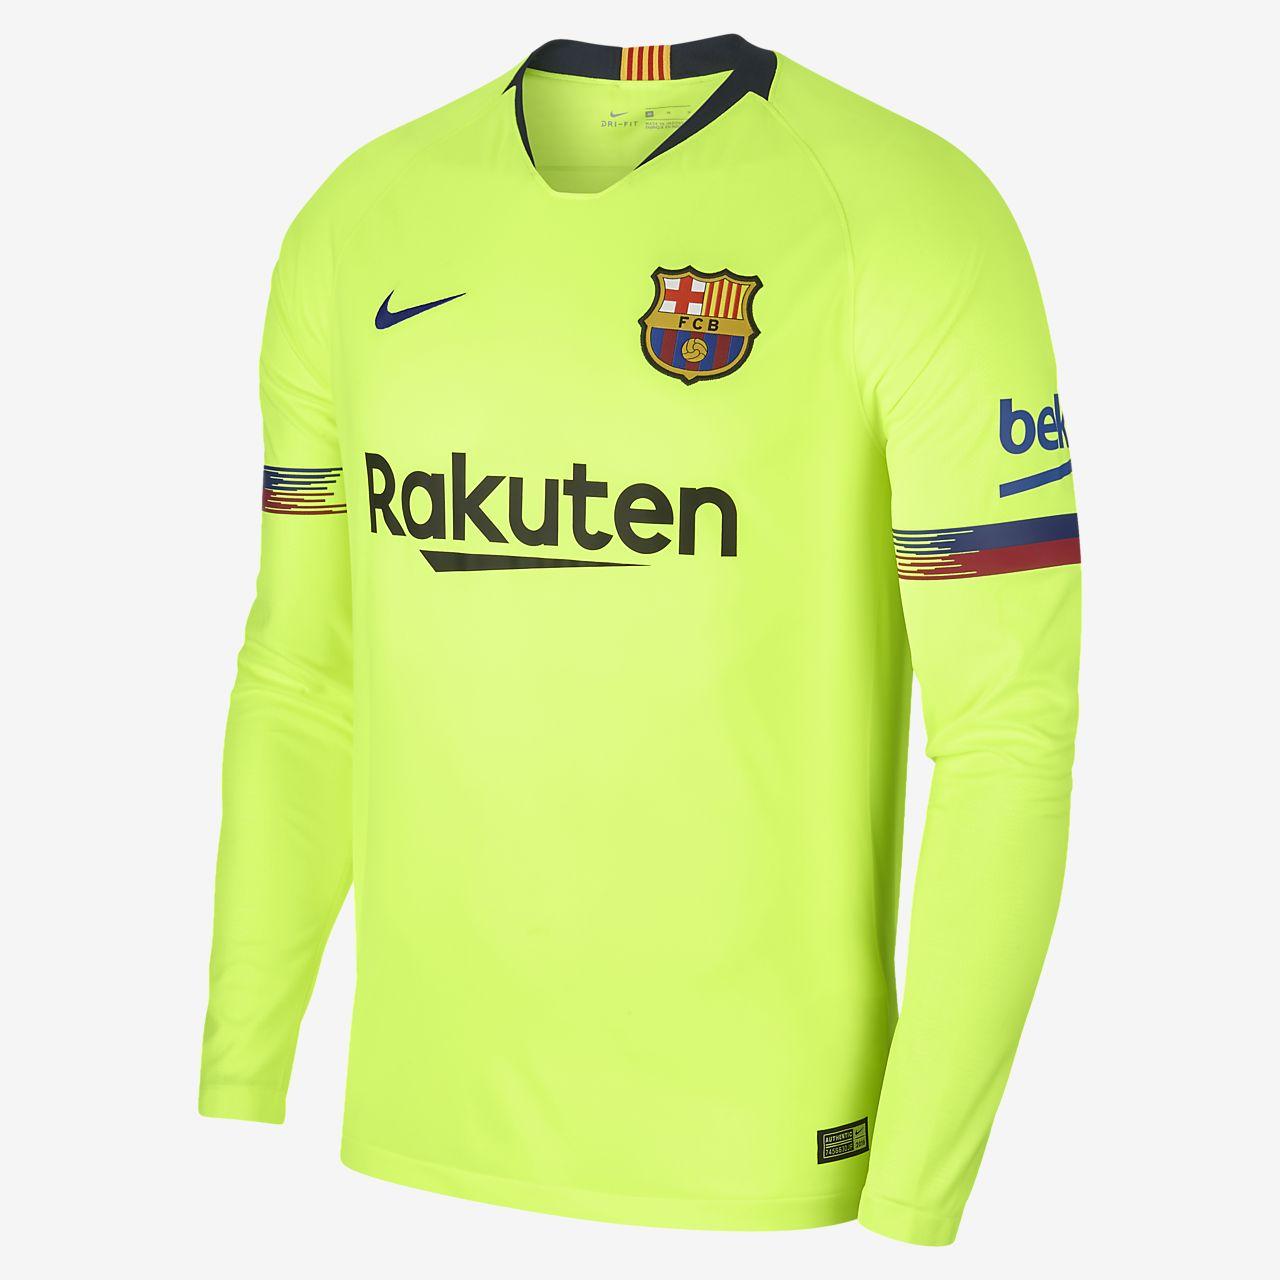 5547ed913 2018/19 FC Barcelona Stadium Away Men's Long-Sleeve Football Shirt ...